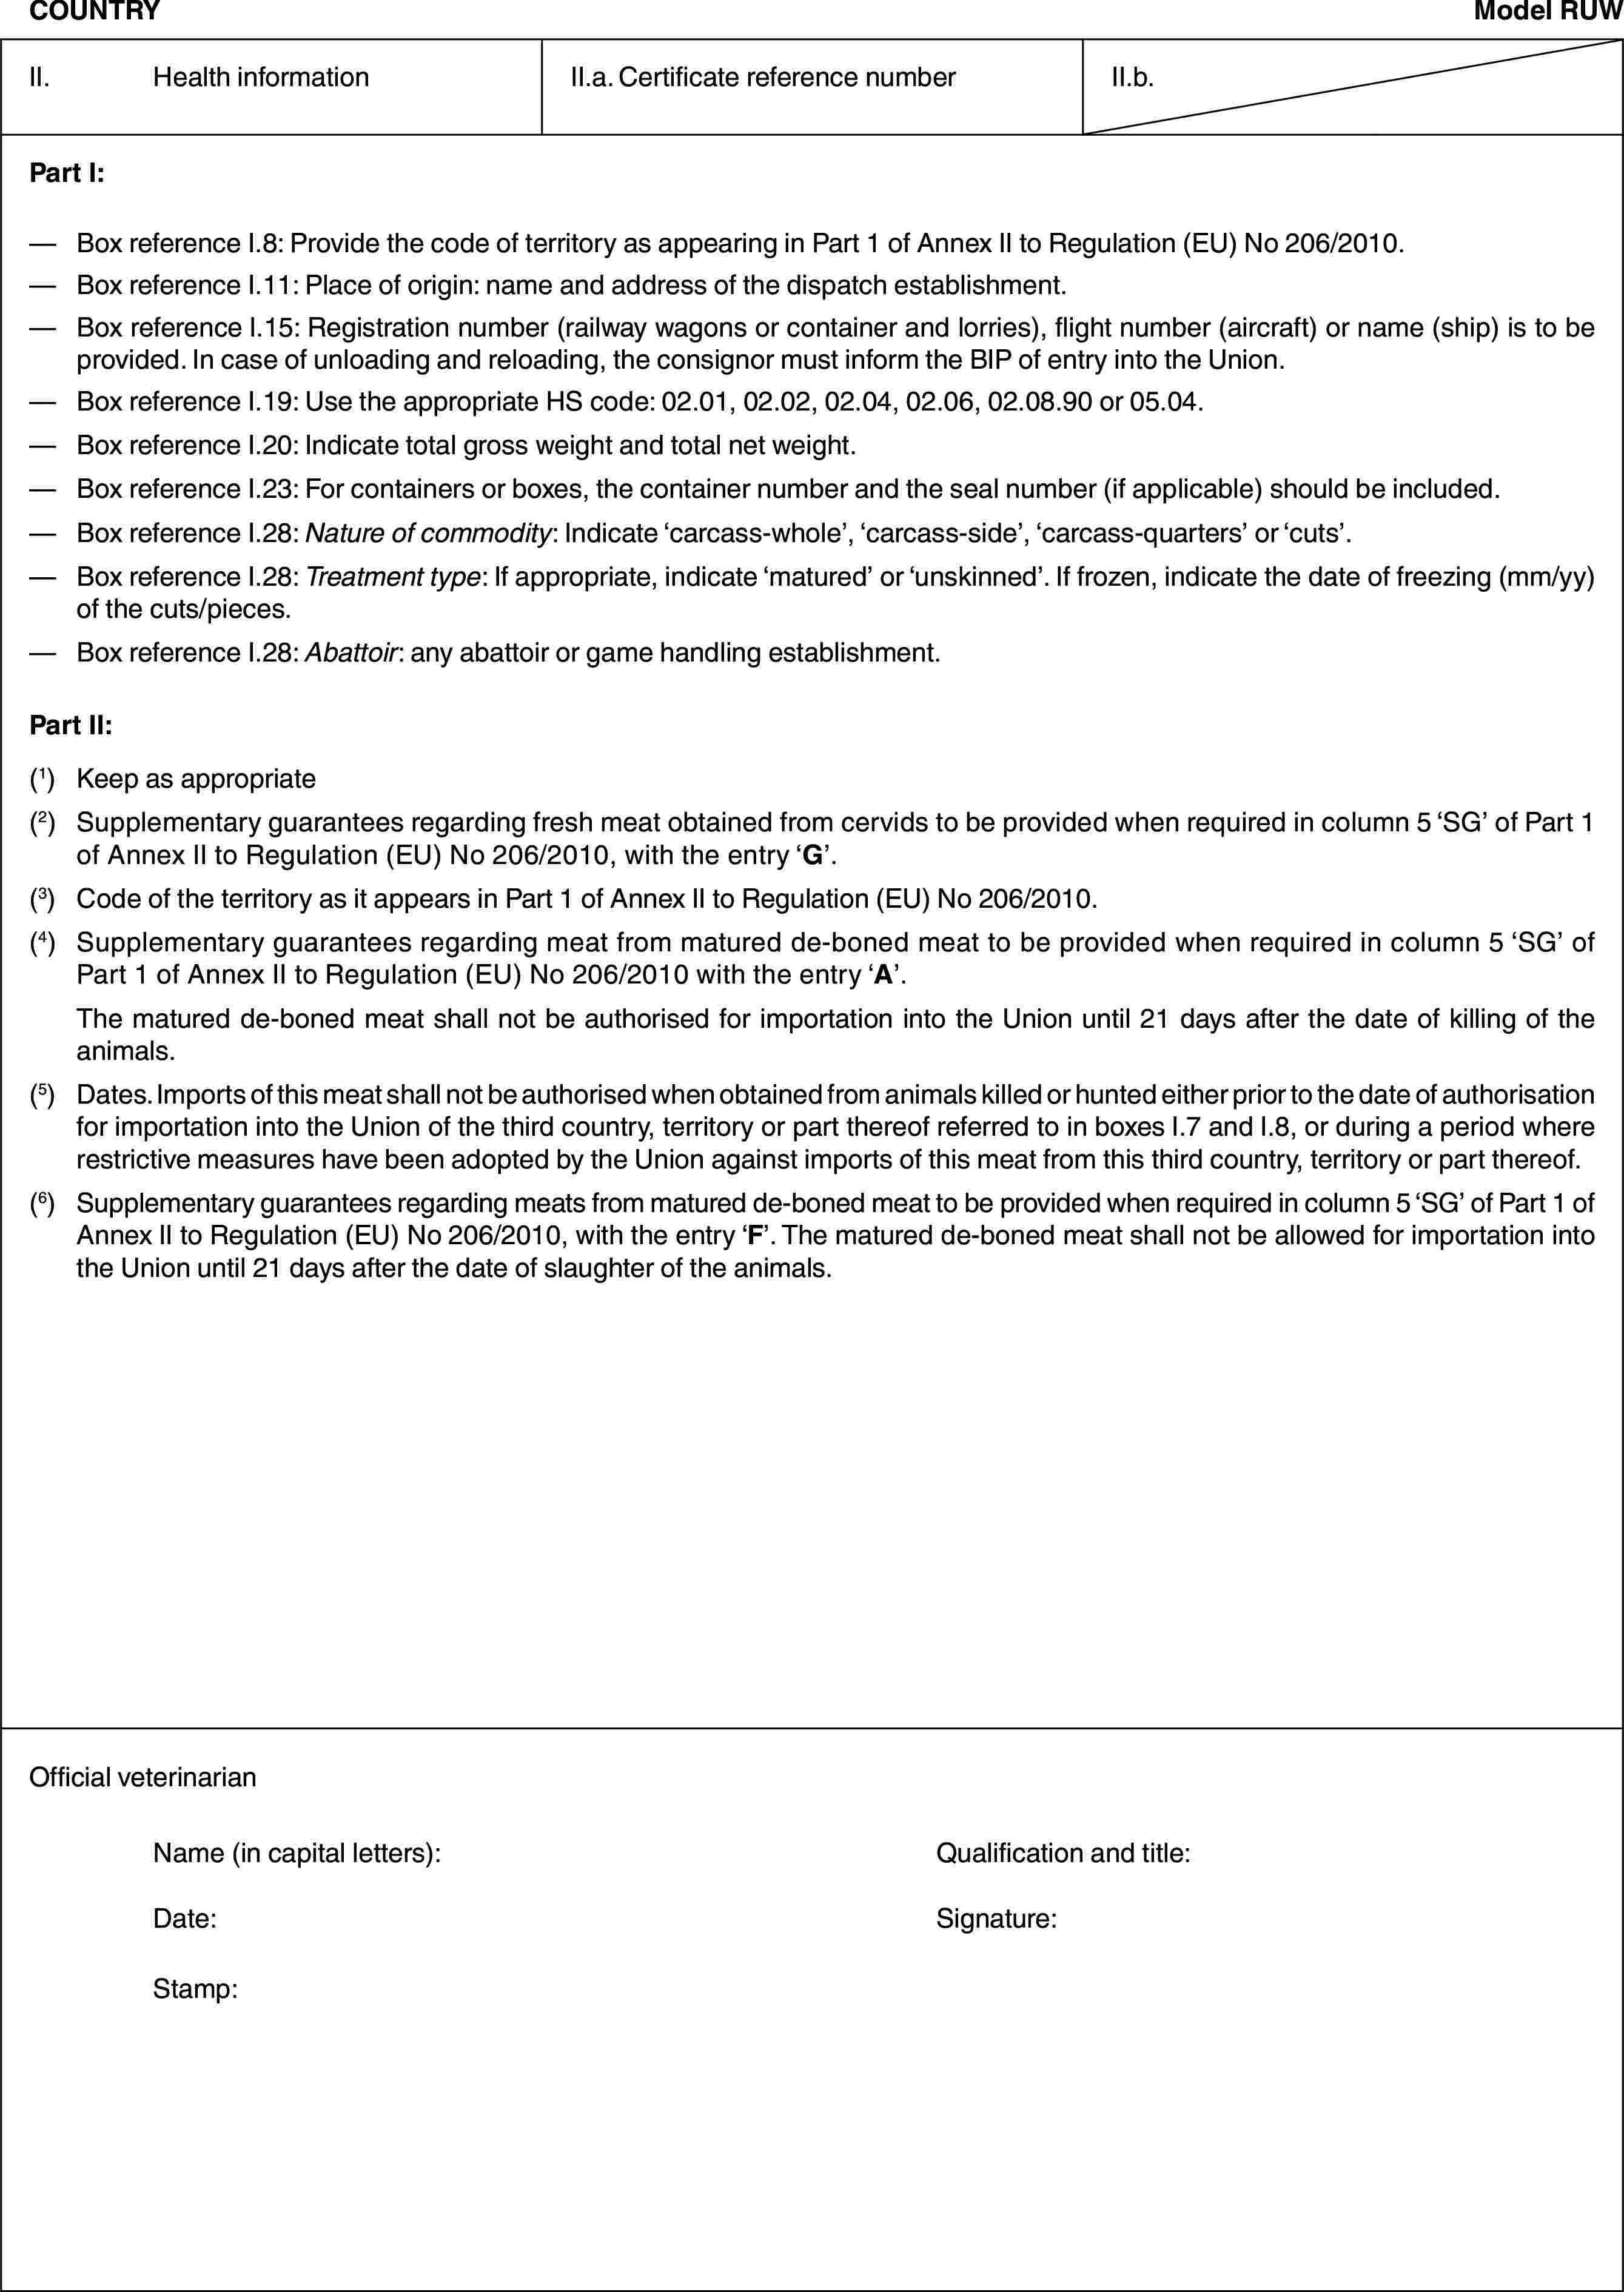 Eur lex 02010r0206 20150617 en eur lex for Equipment installation qualification template